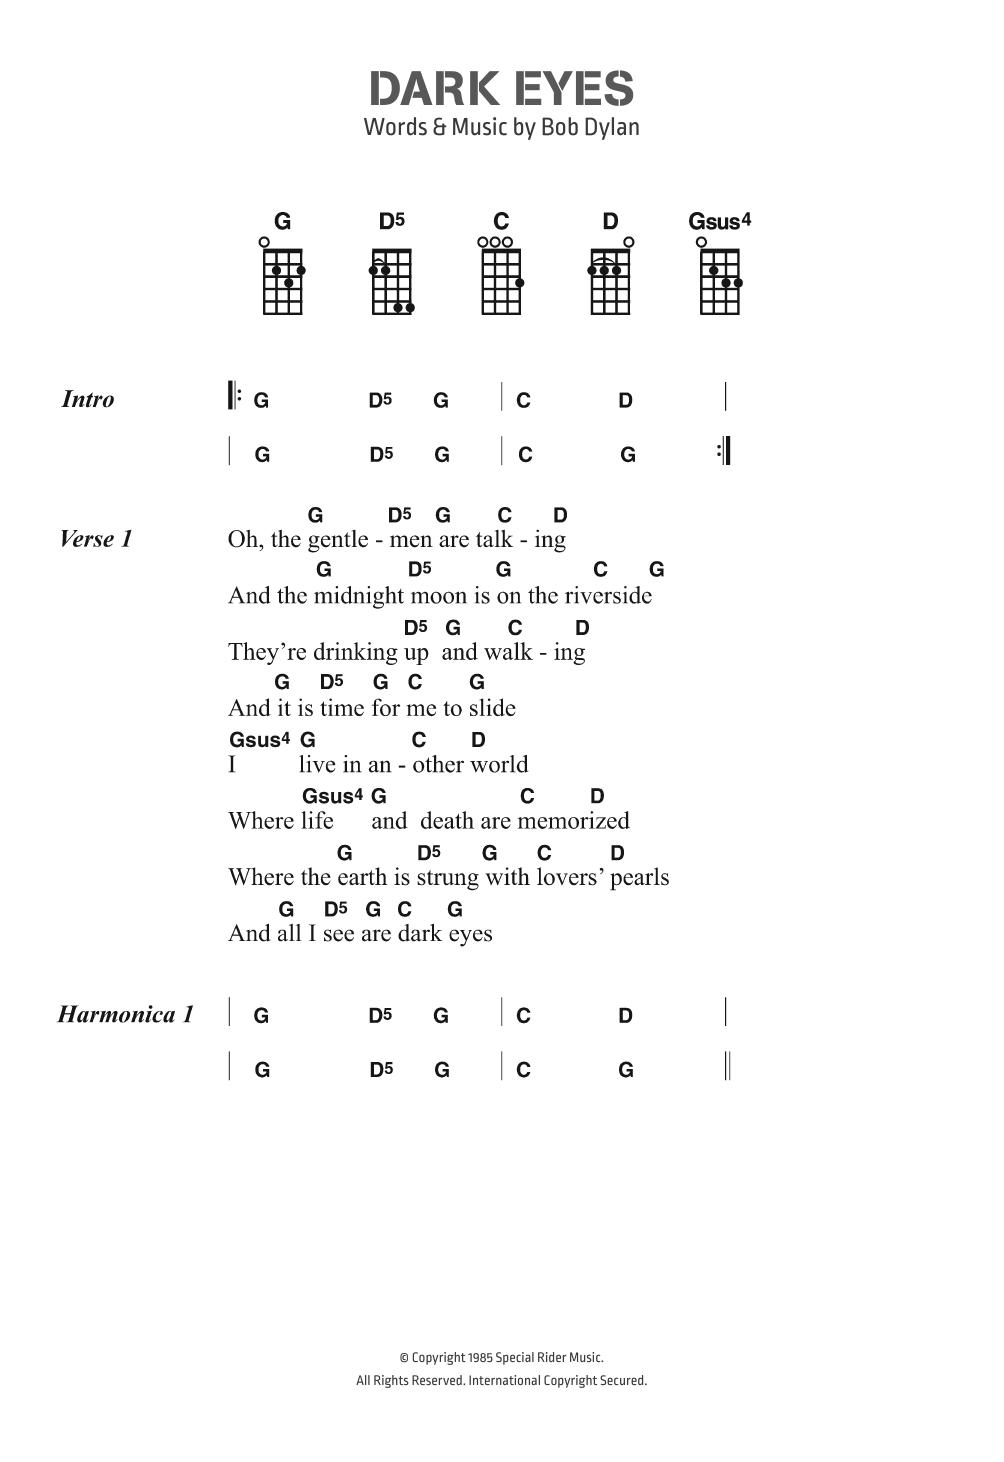 Dark Eyes Sheet Music | Bob Dylan | Ukulele Chords/Lyrics